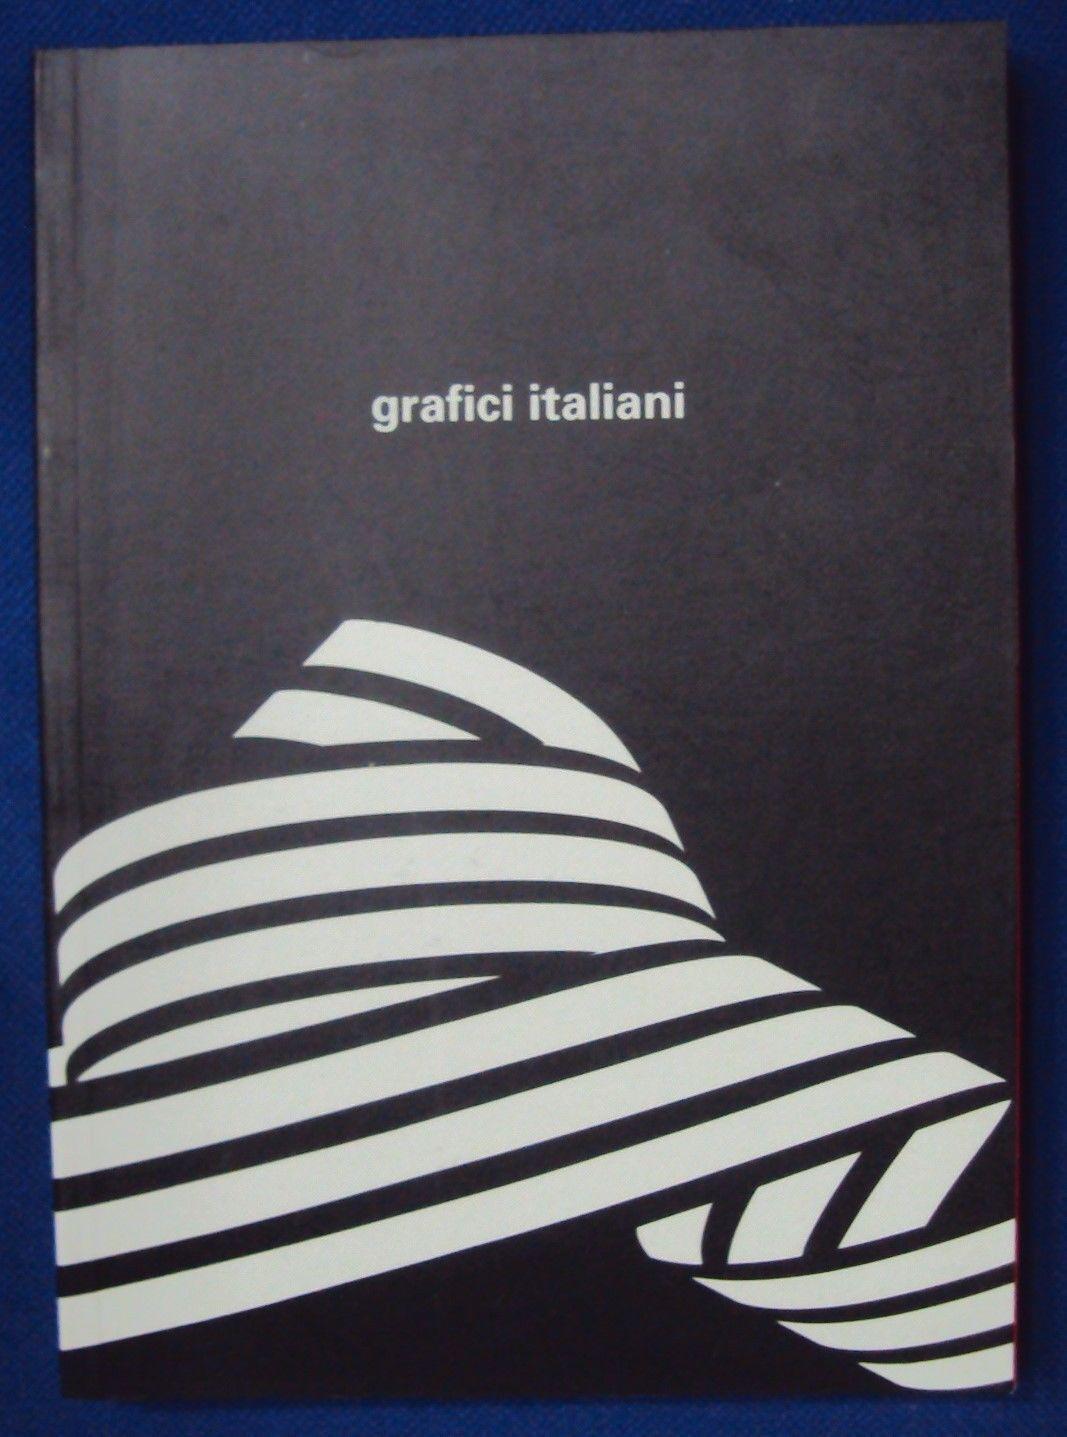 Grafici italiani